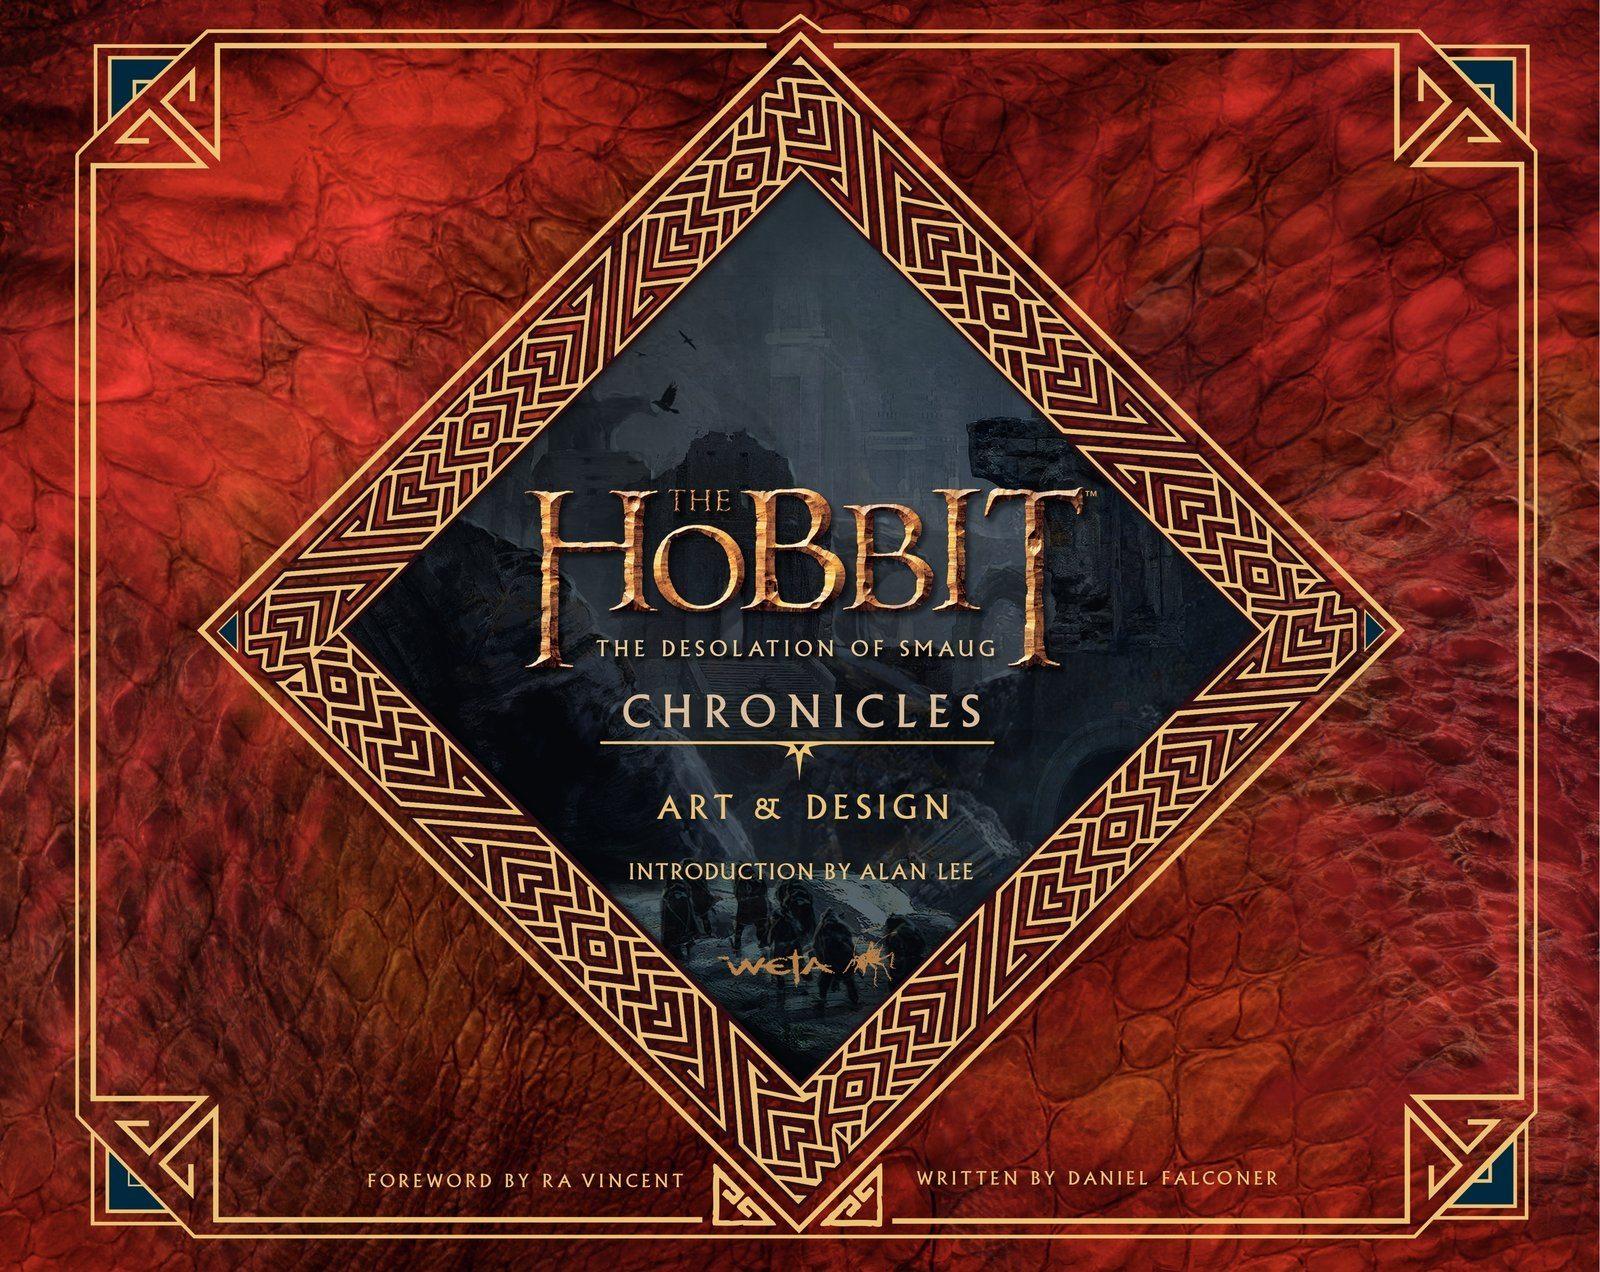 The Hobbit: The Desolation of Smaug Chronicles: Art & Design